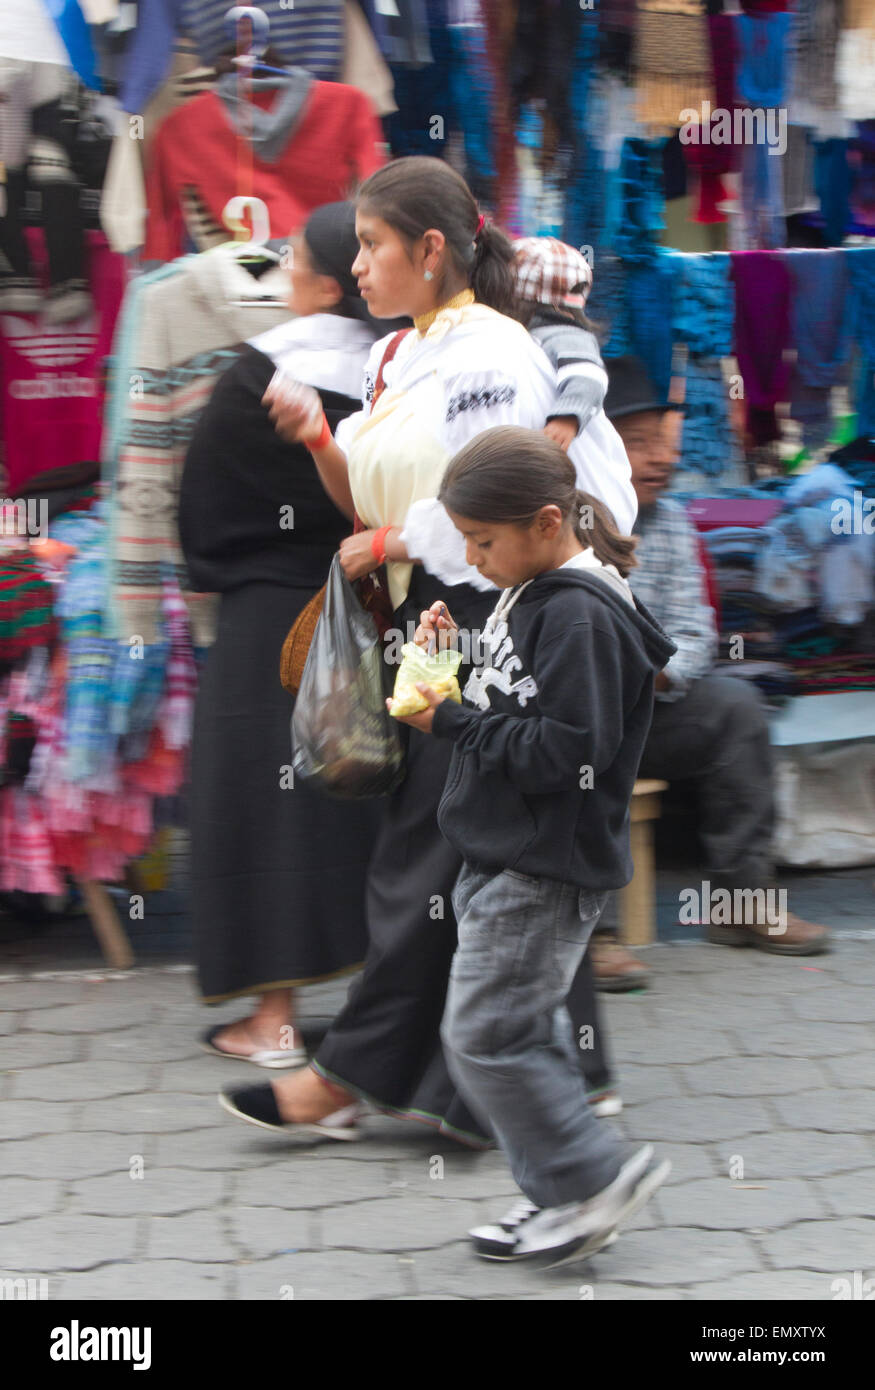 Shoppers walking through marketplace at Otavalo market, Ecuador - Stock Image